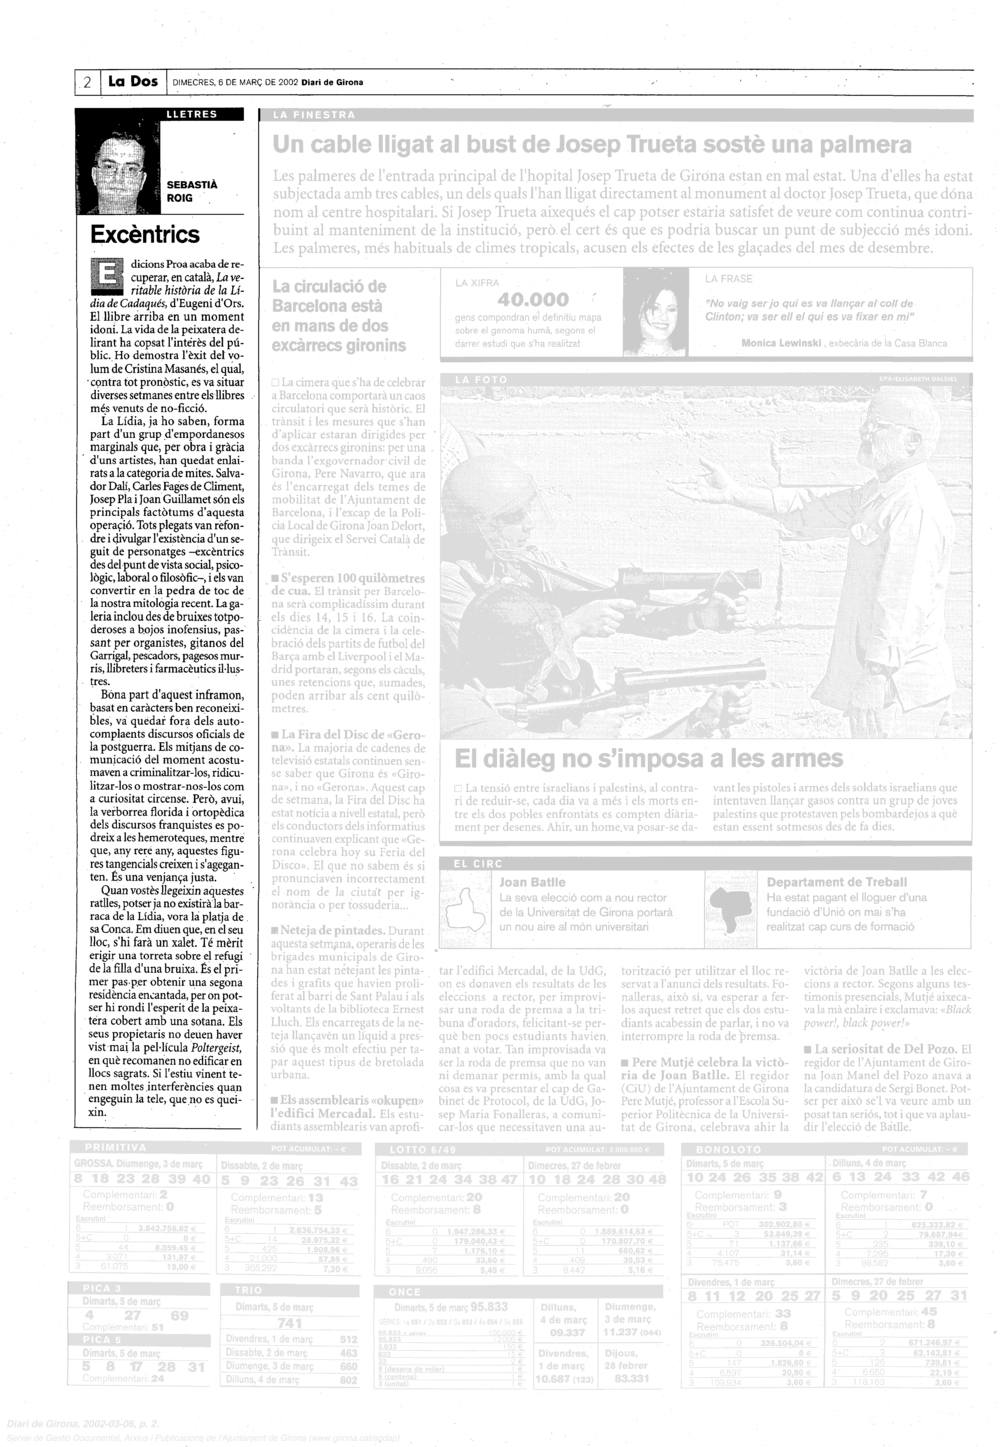 LídiaCadaqués_DIARIGIRONAcolumna_S.Roig copia.jpg